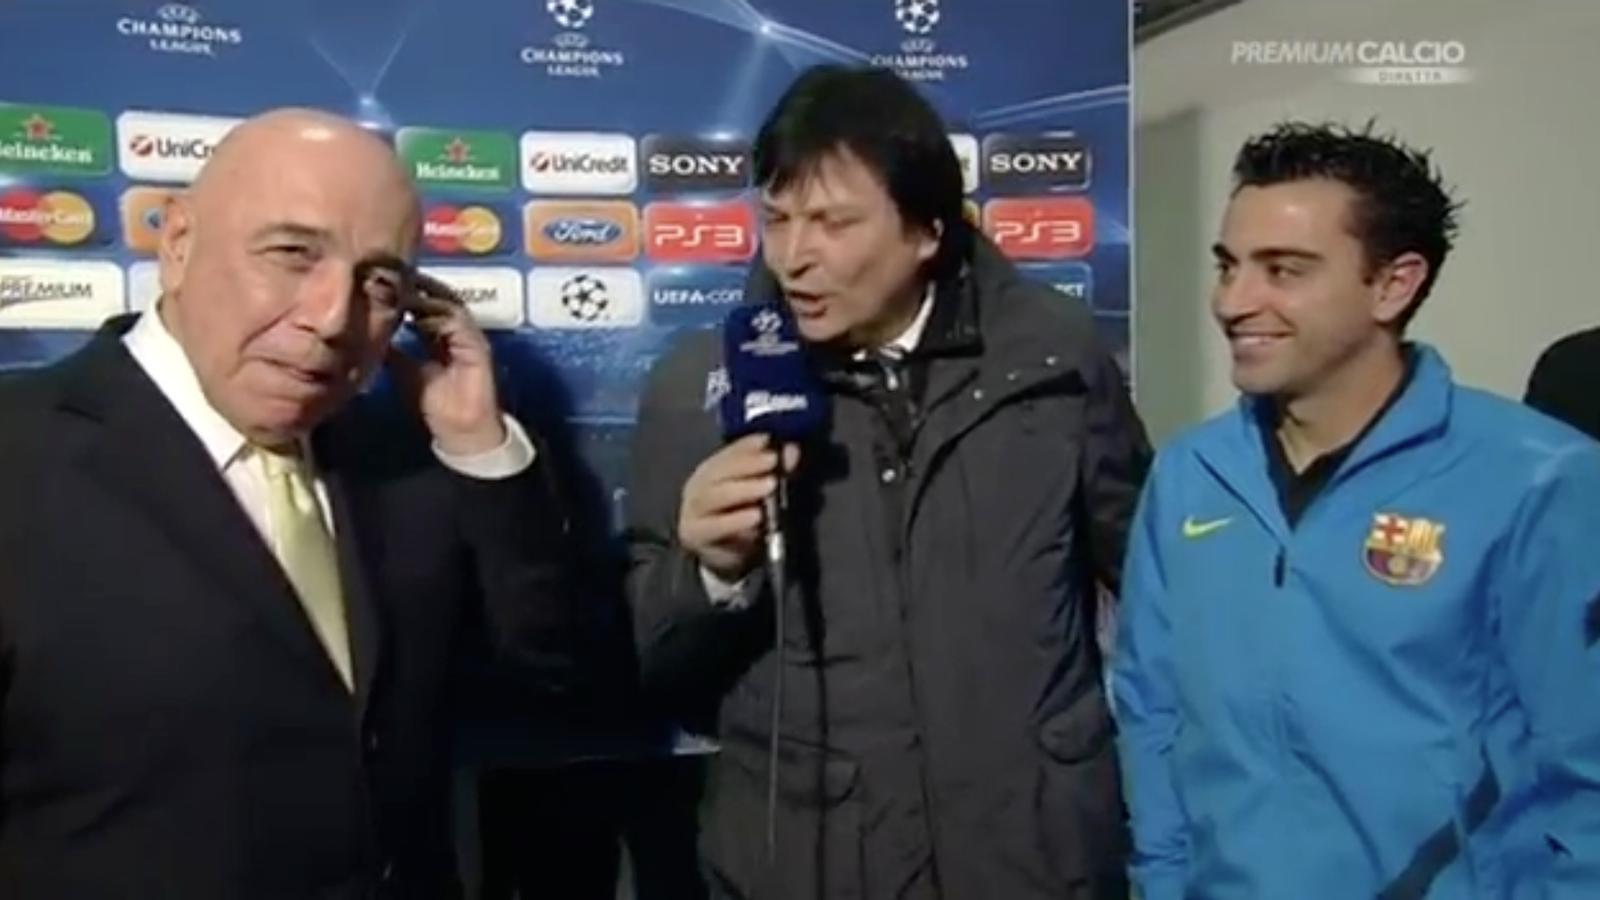 Adriano Galliani explica com va intentar fitxar Xavi